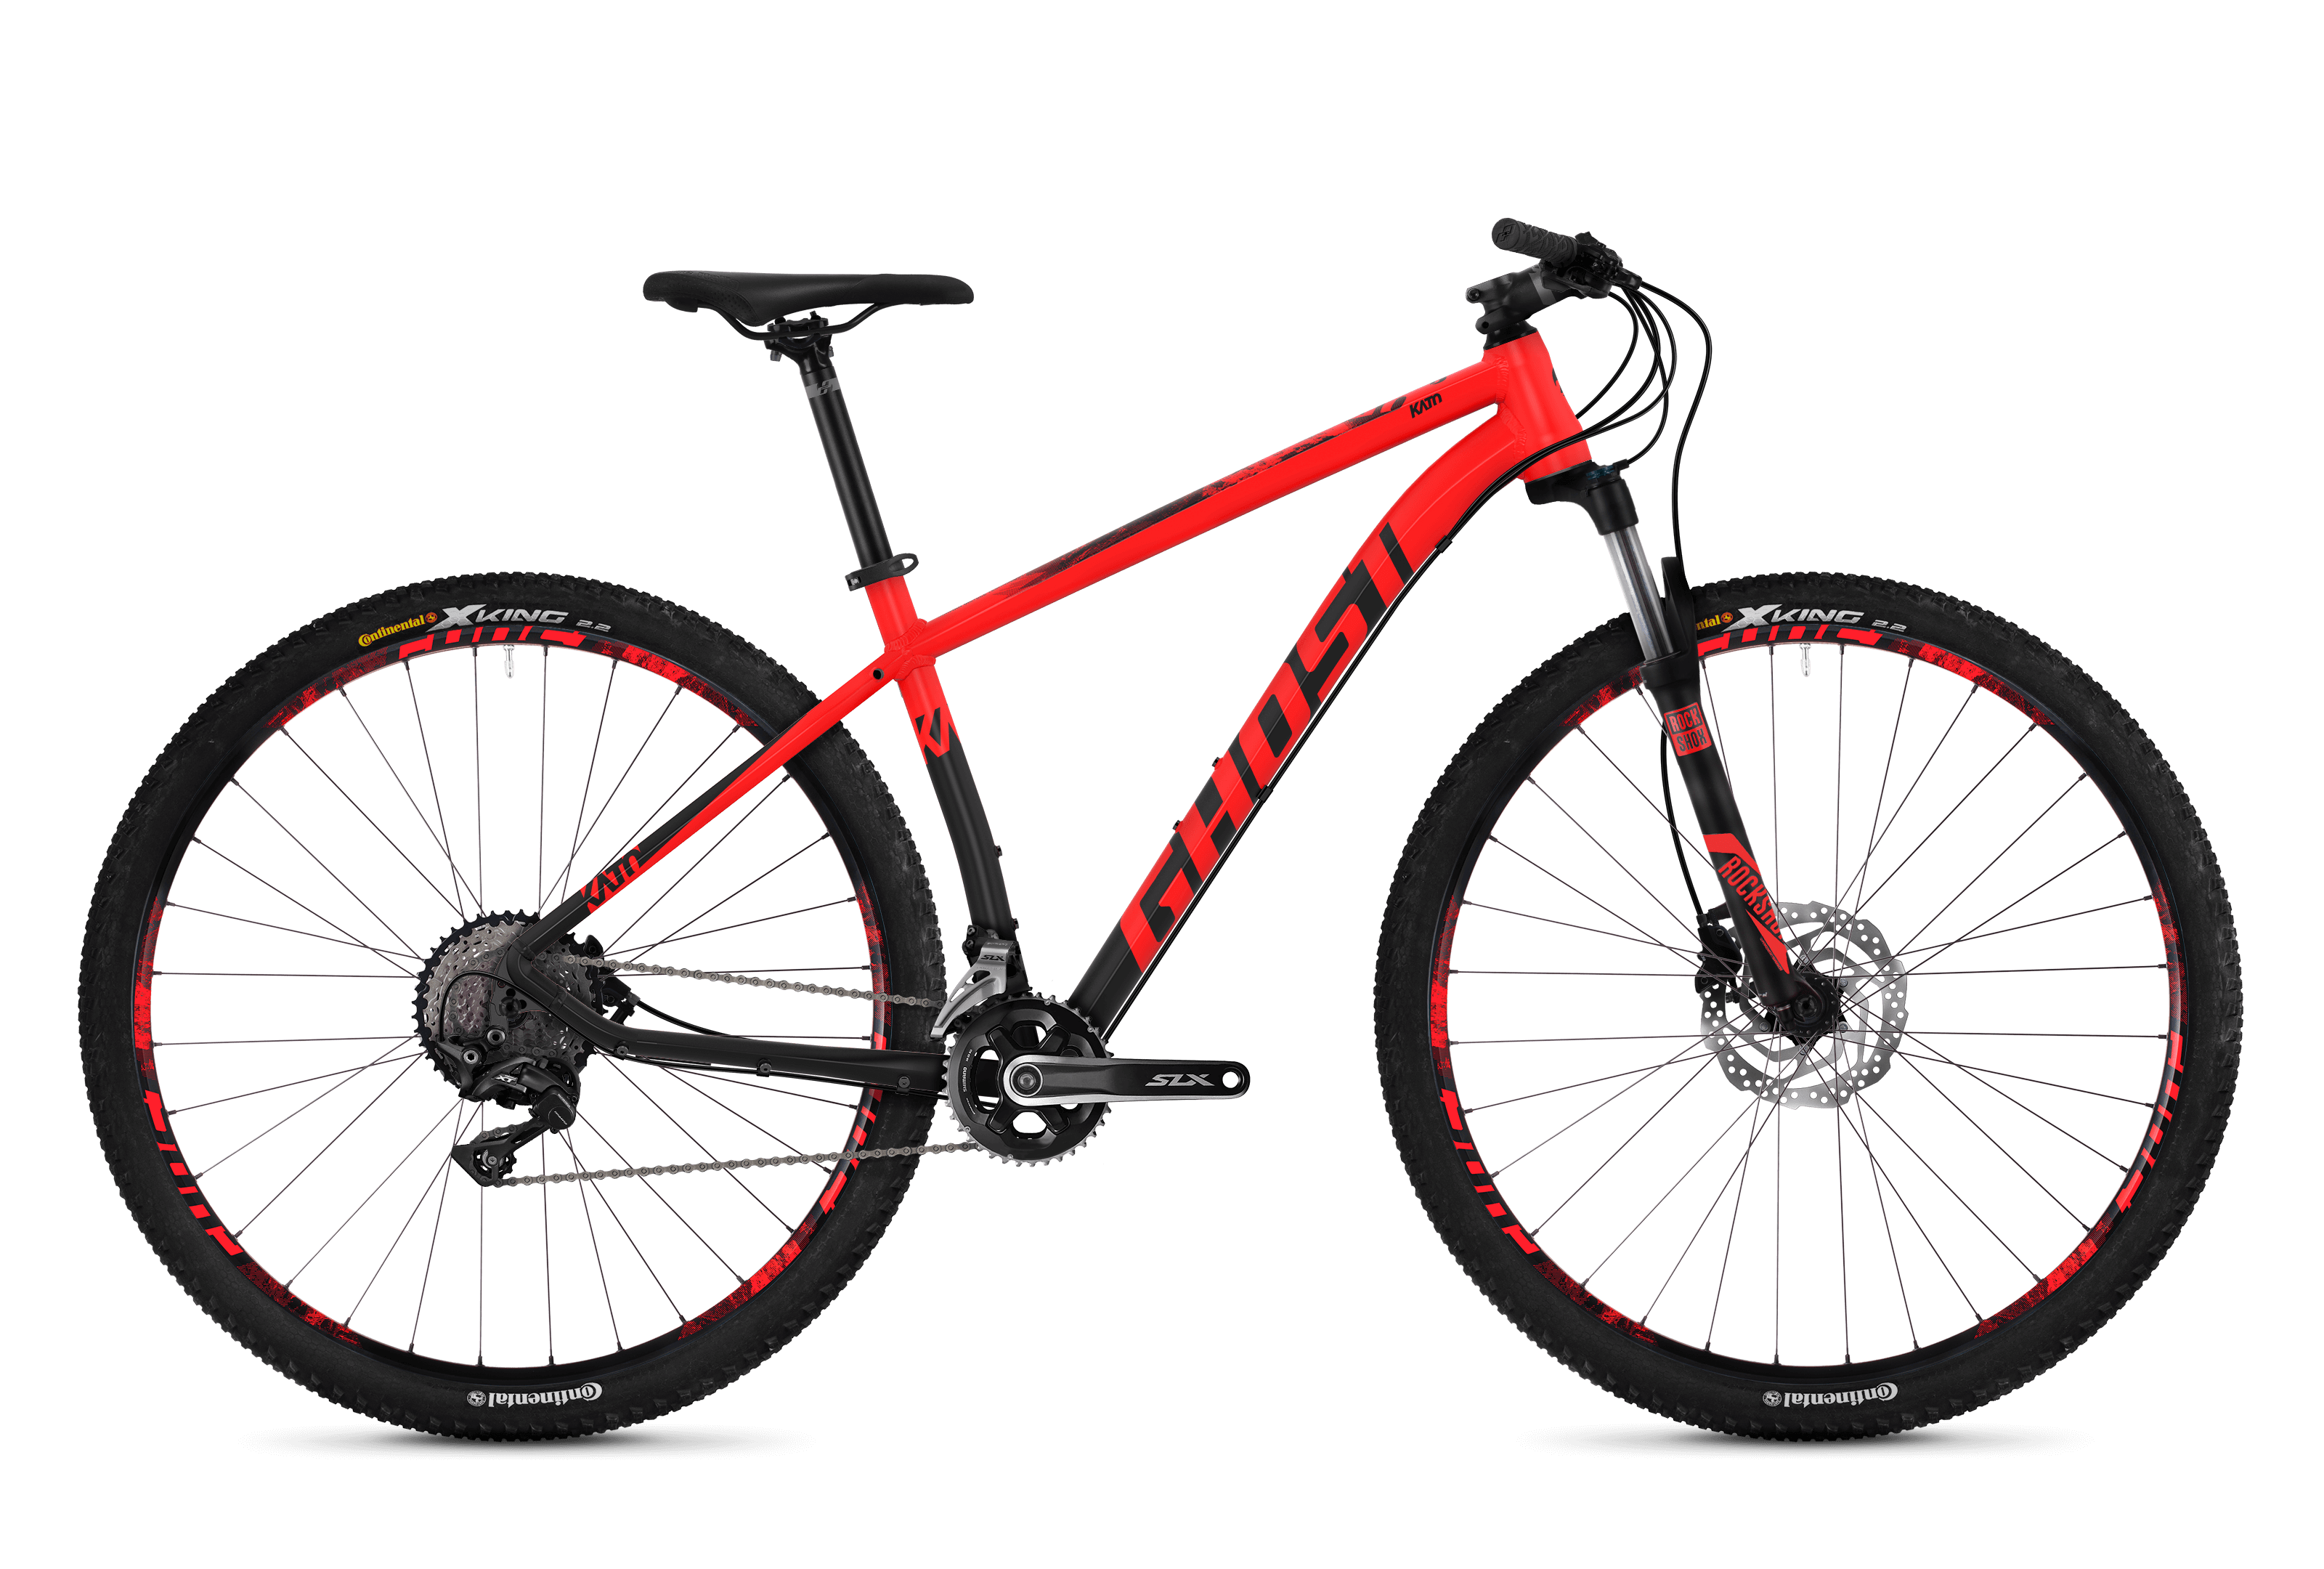 Horské kolo GHOST Kato 7.9 red / black XL 2018